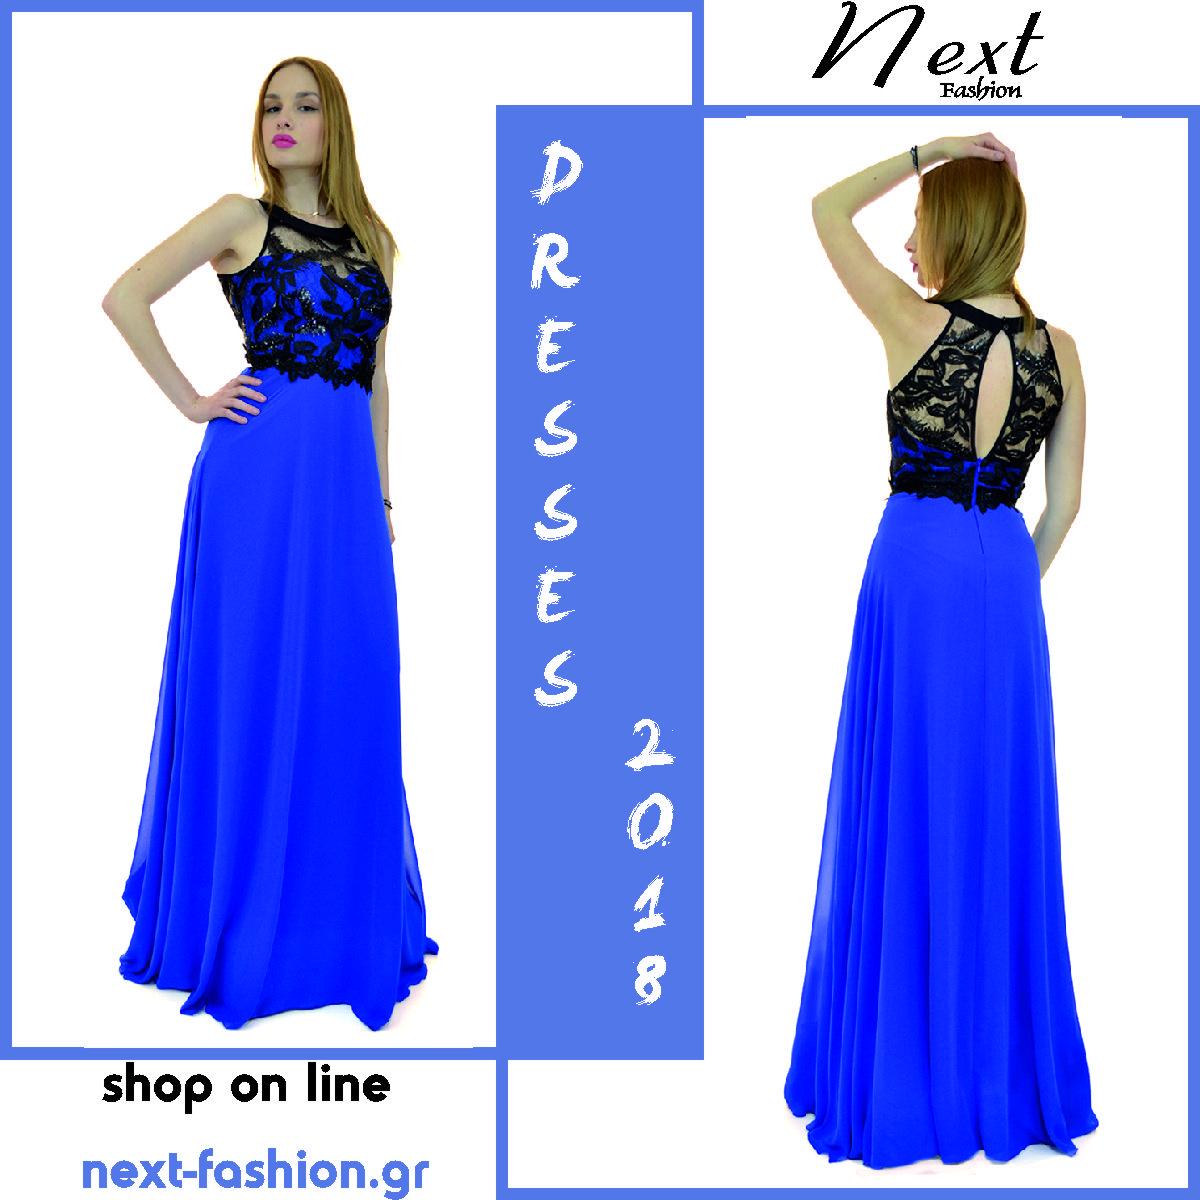 533cba5dc447 Φόρεμα Maxi με Μπούστο Δαντέλα   Παγιέτες